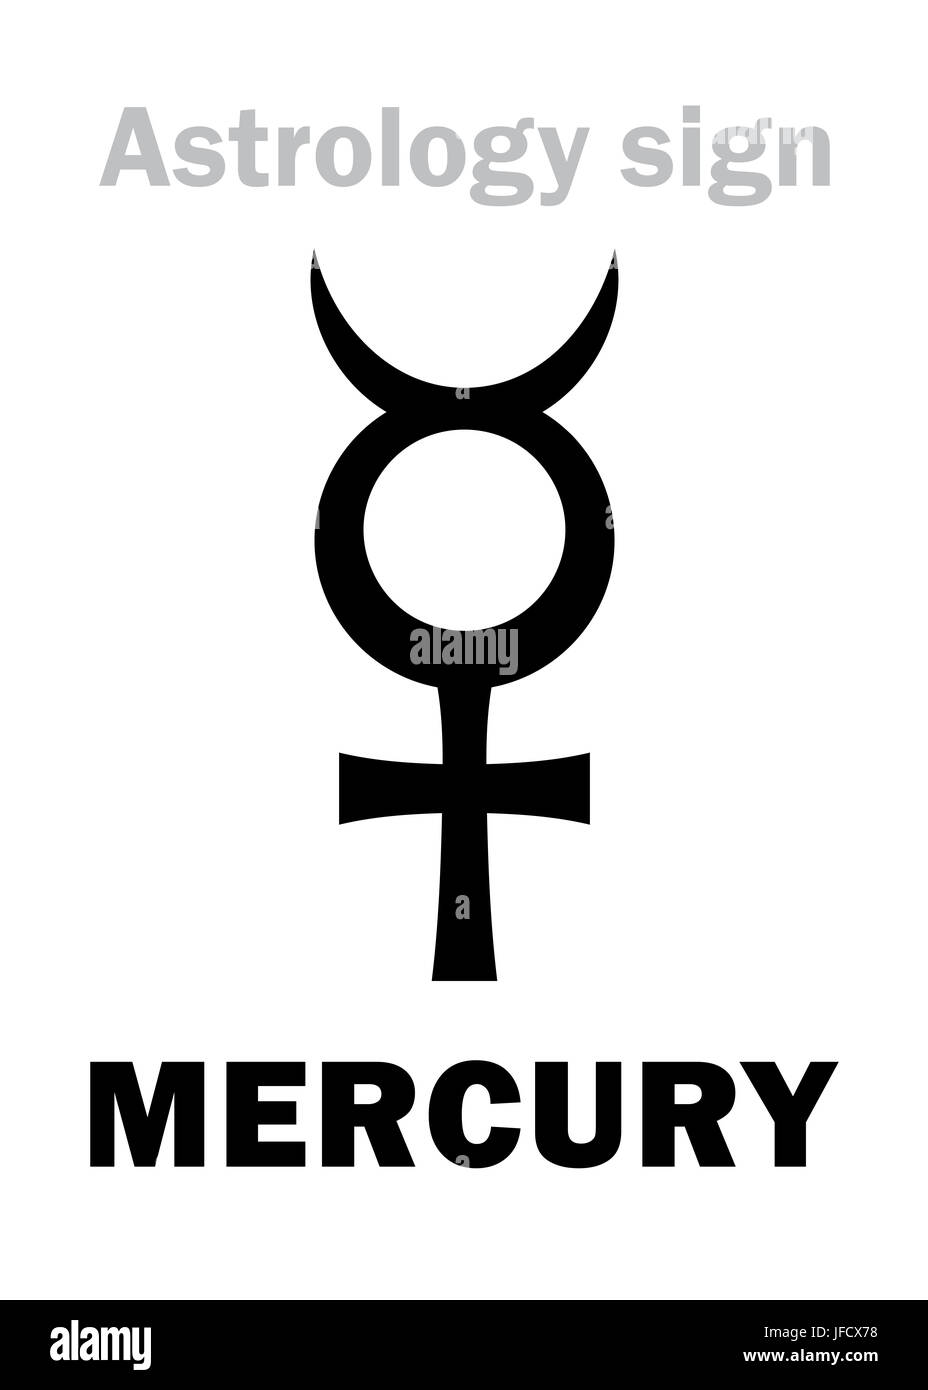 Astrology planet mercury stock photo royalty free image astrology planet mercury buycottarizona Choice Image